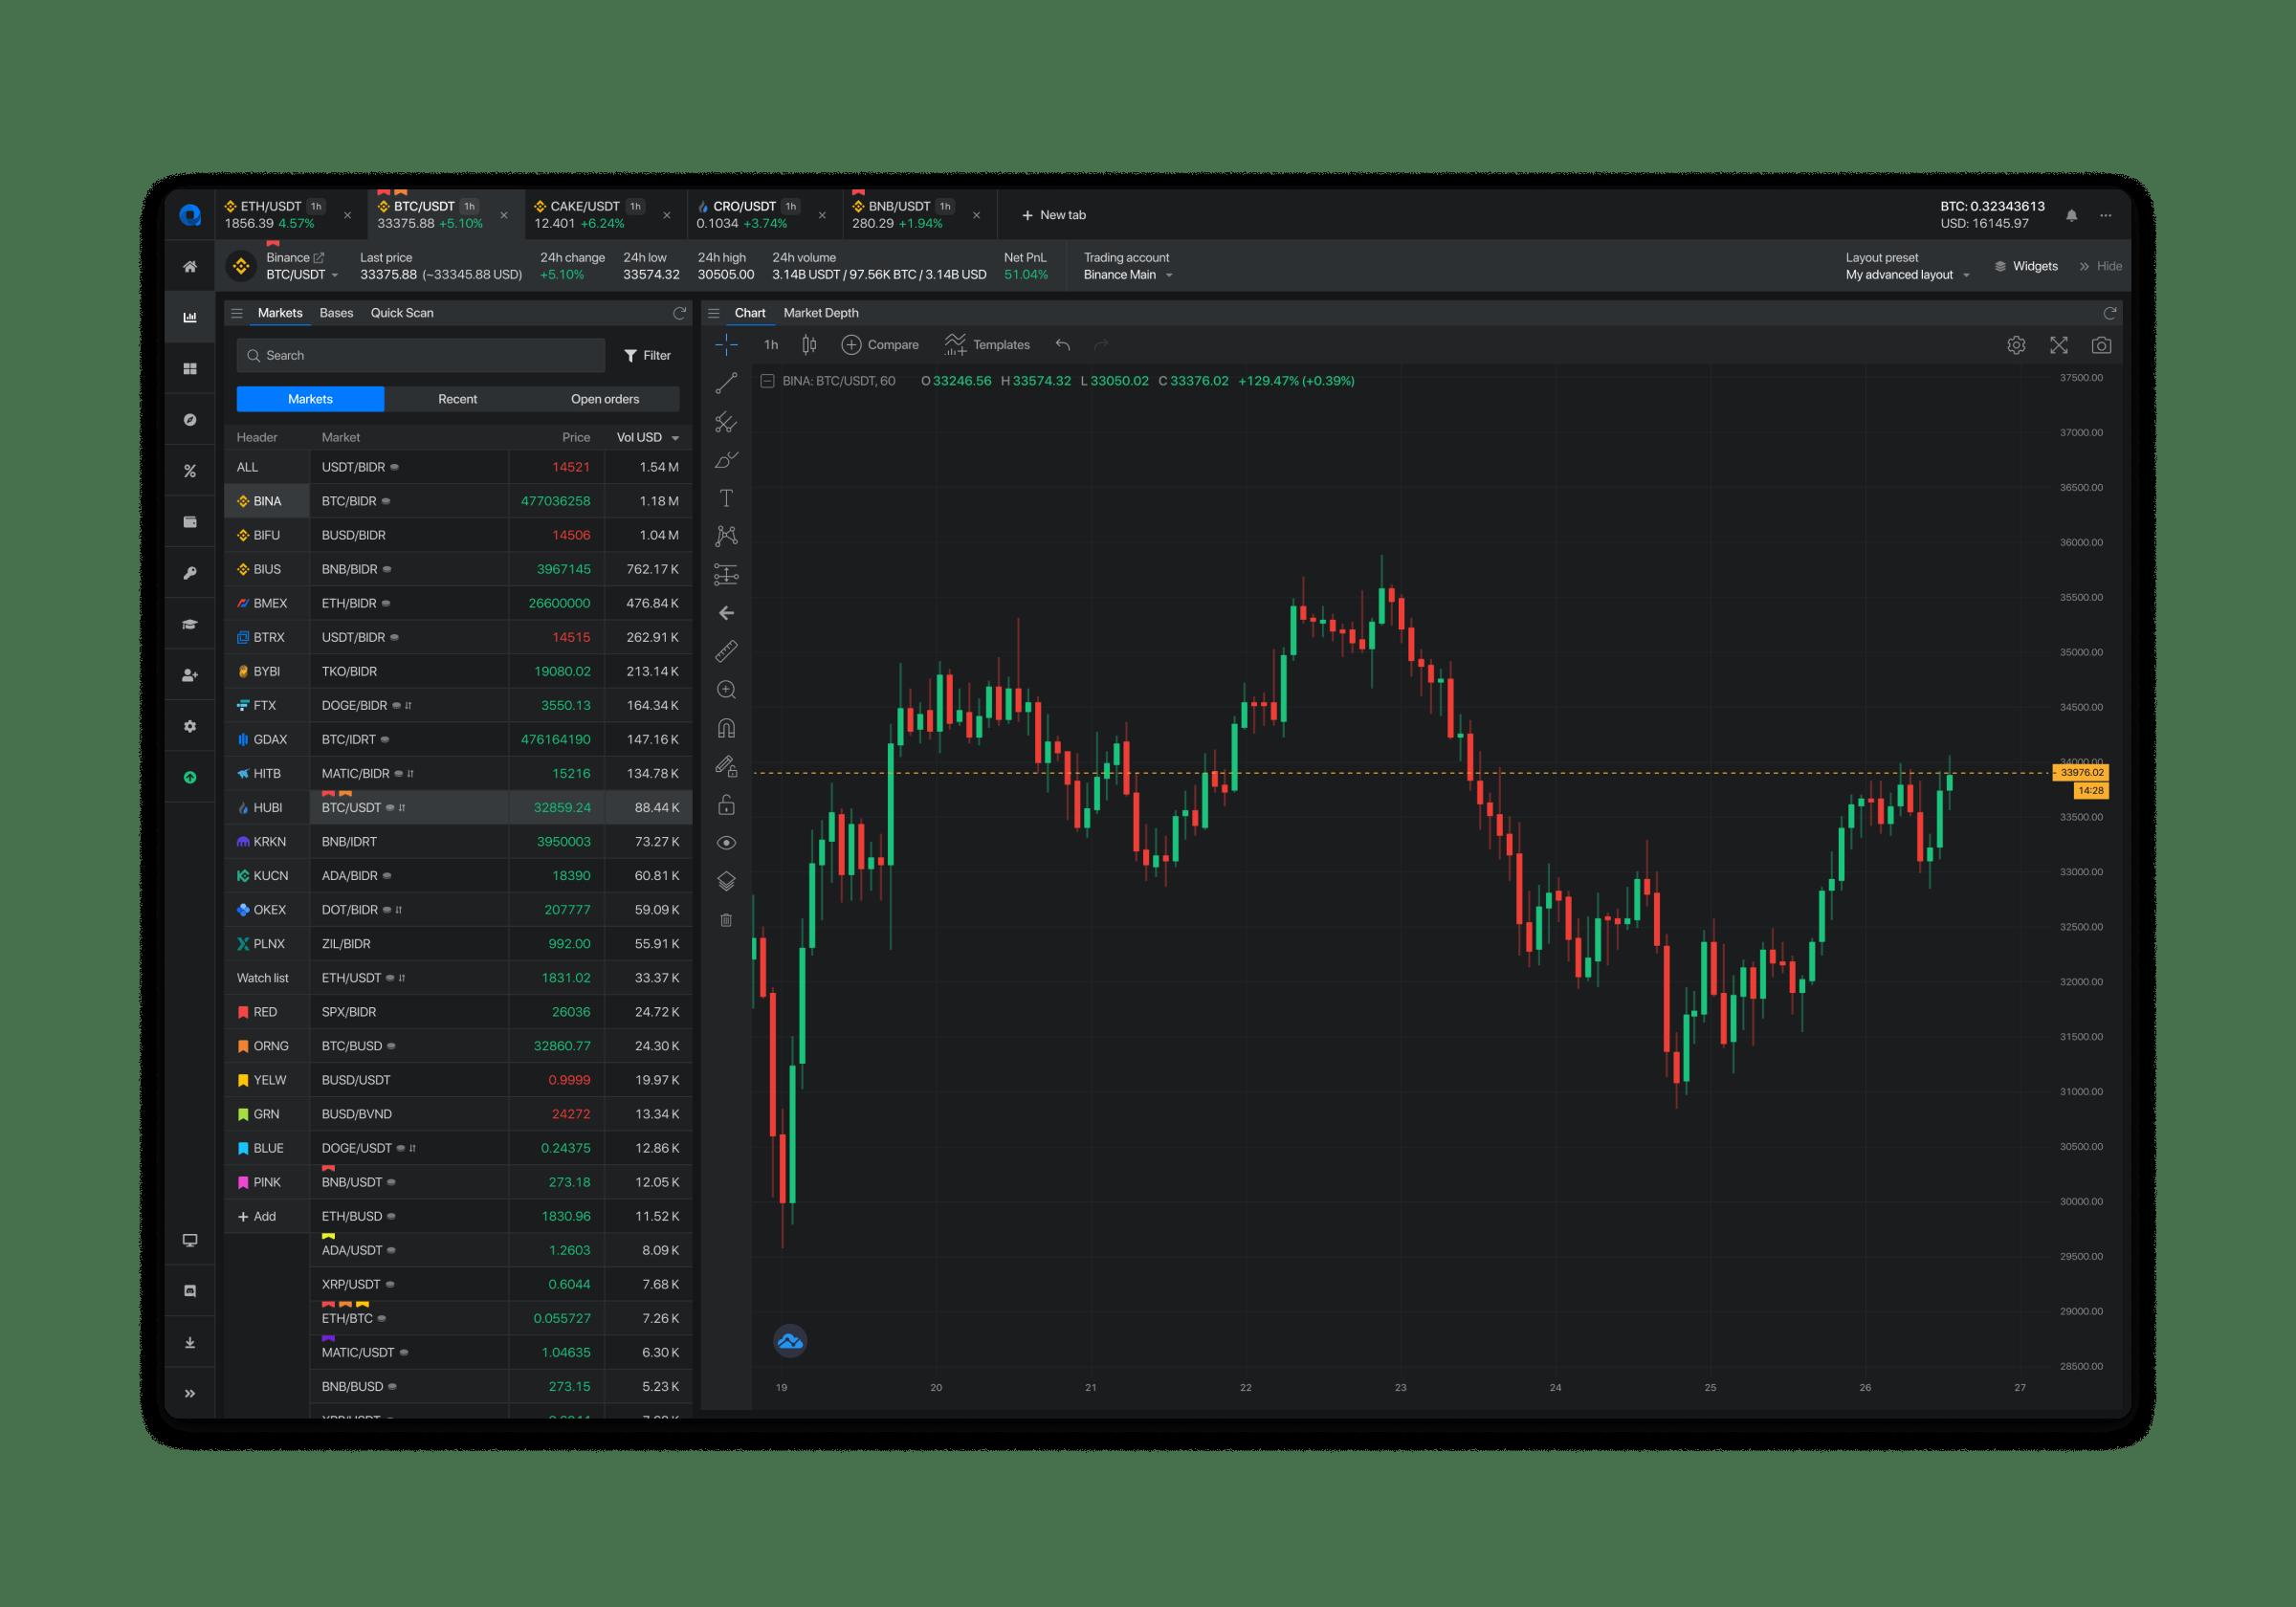 Market searching